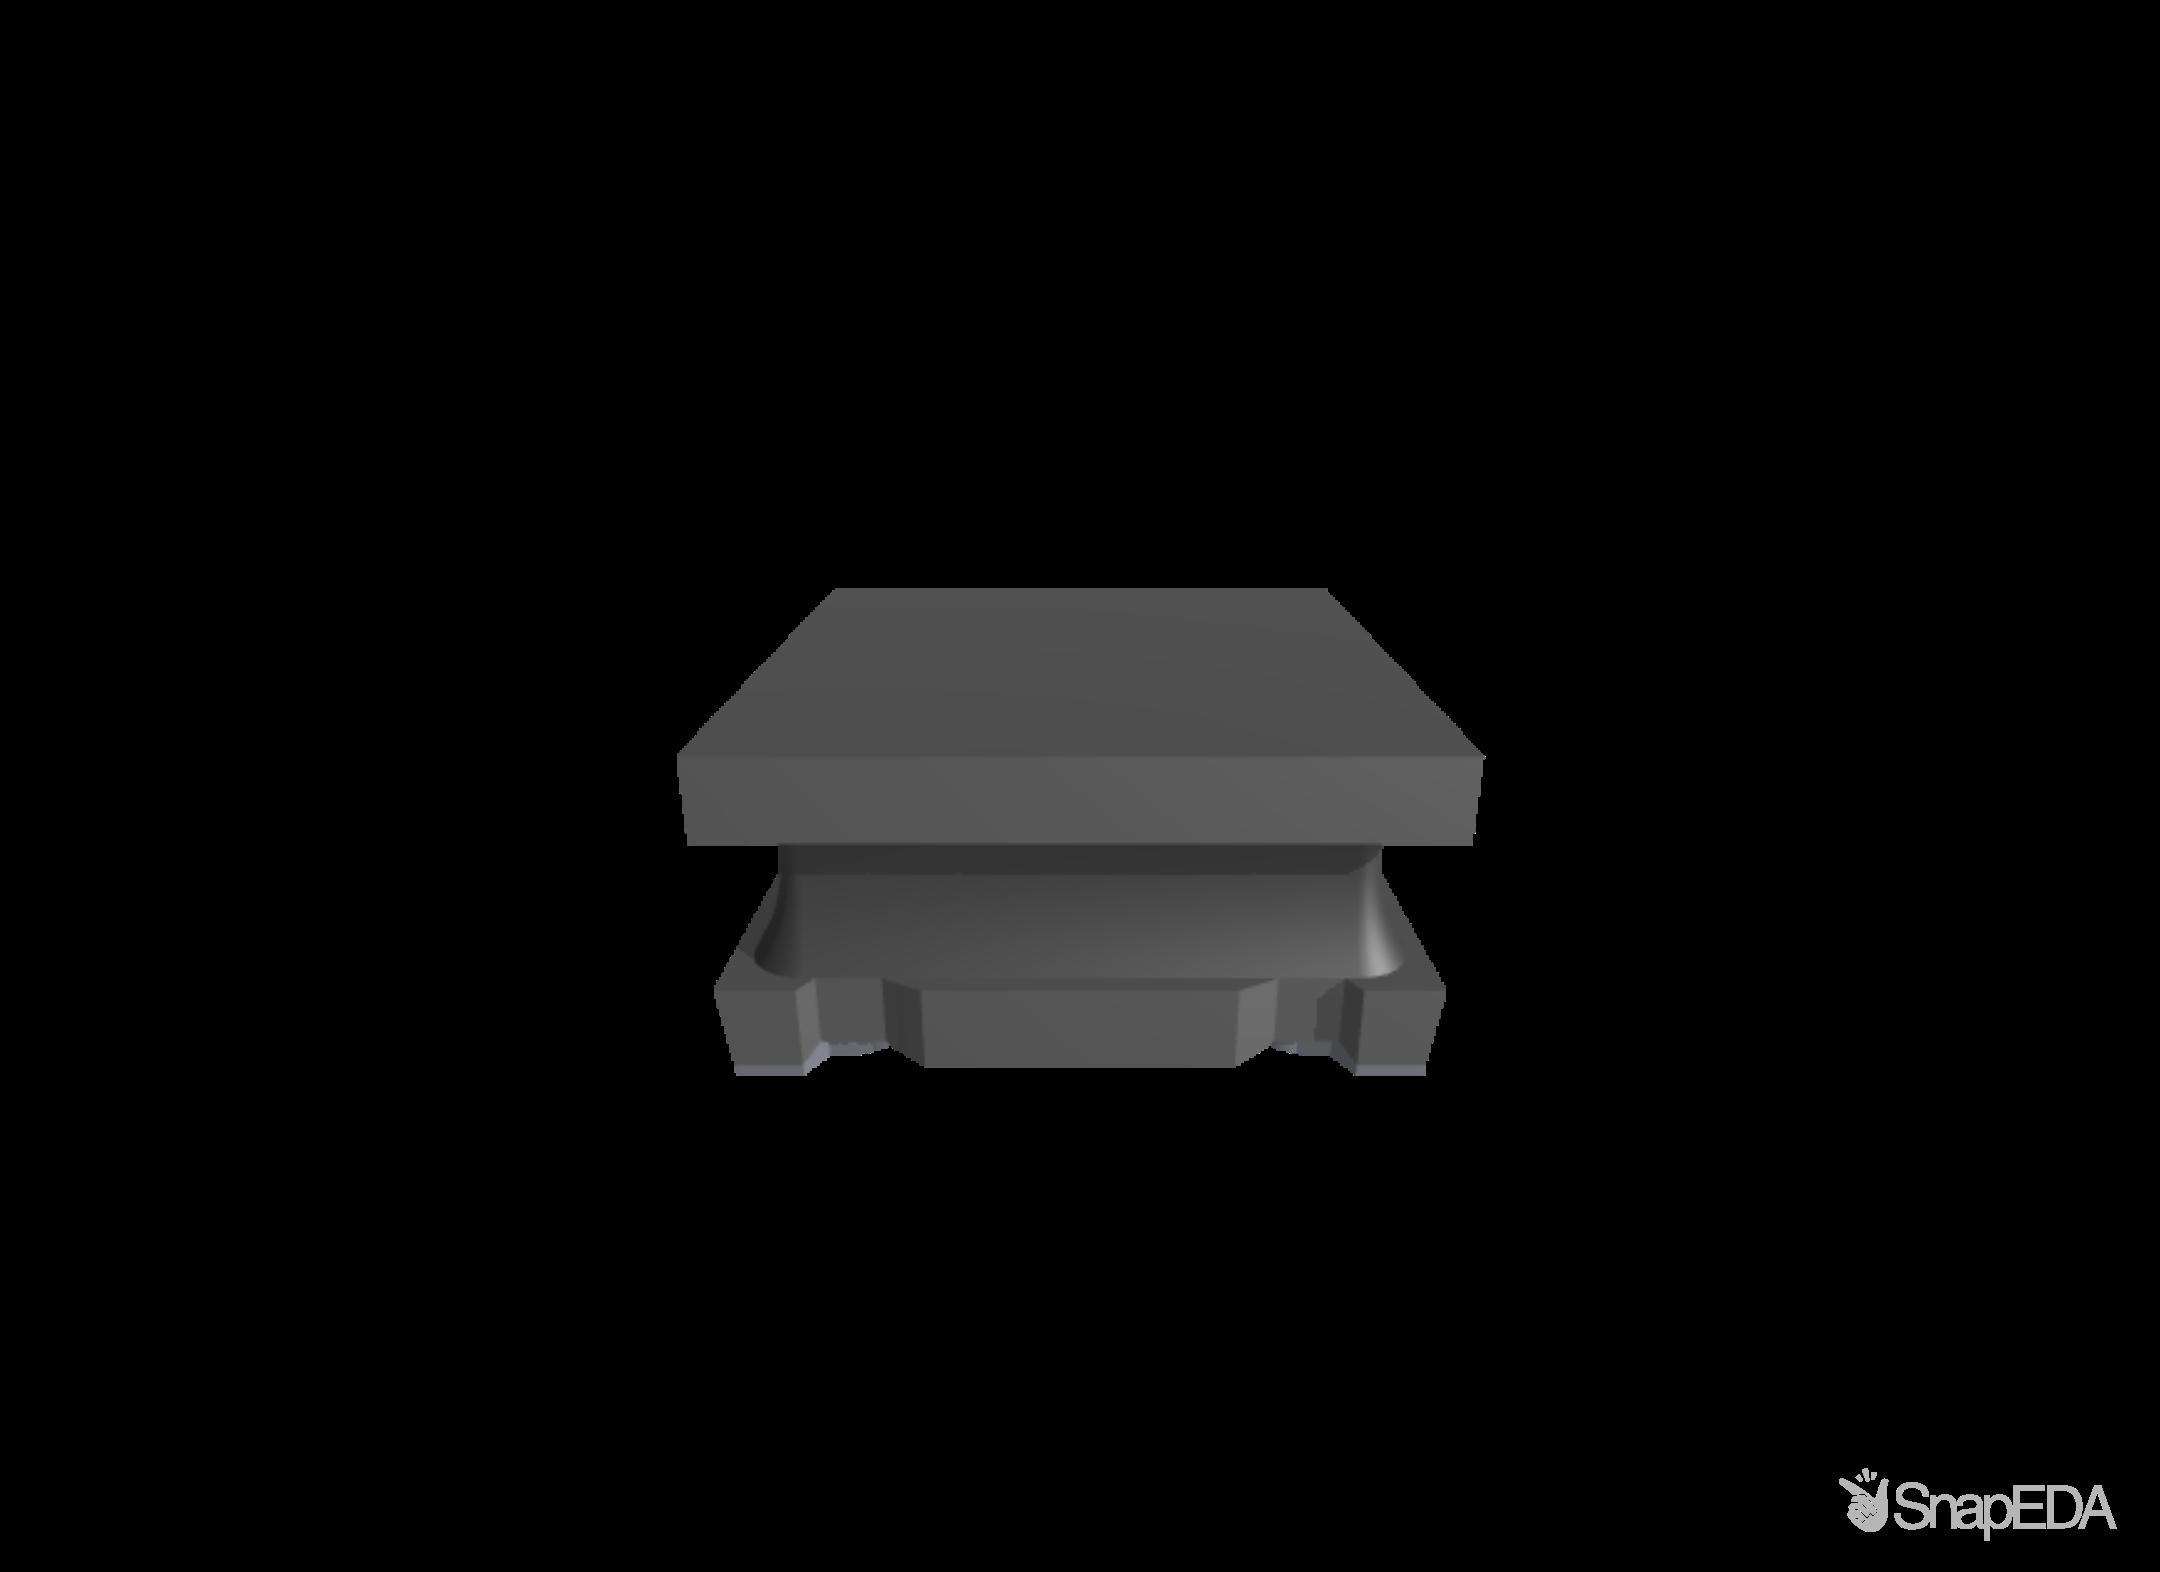 LQH3NPN2R2MMEL 3D Model